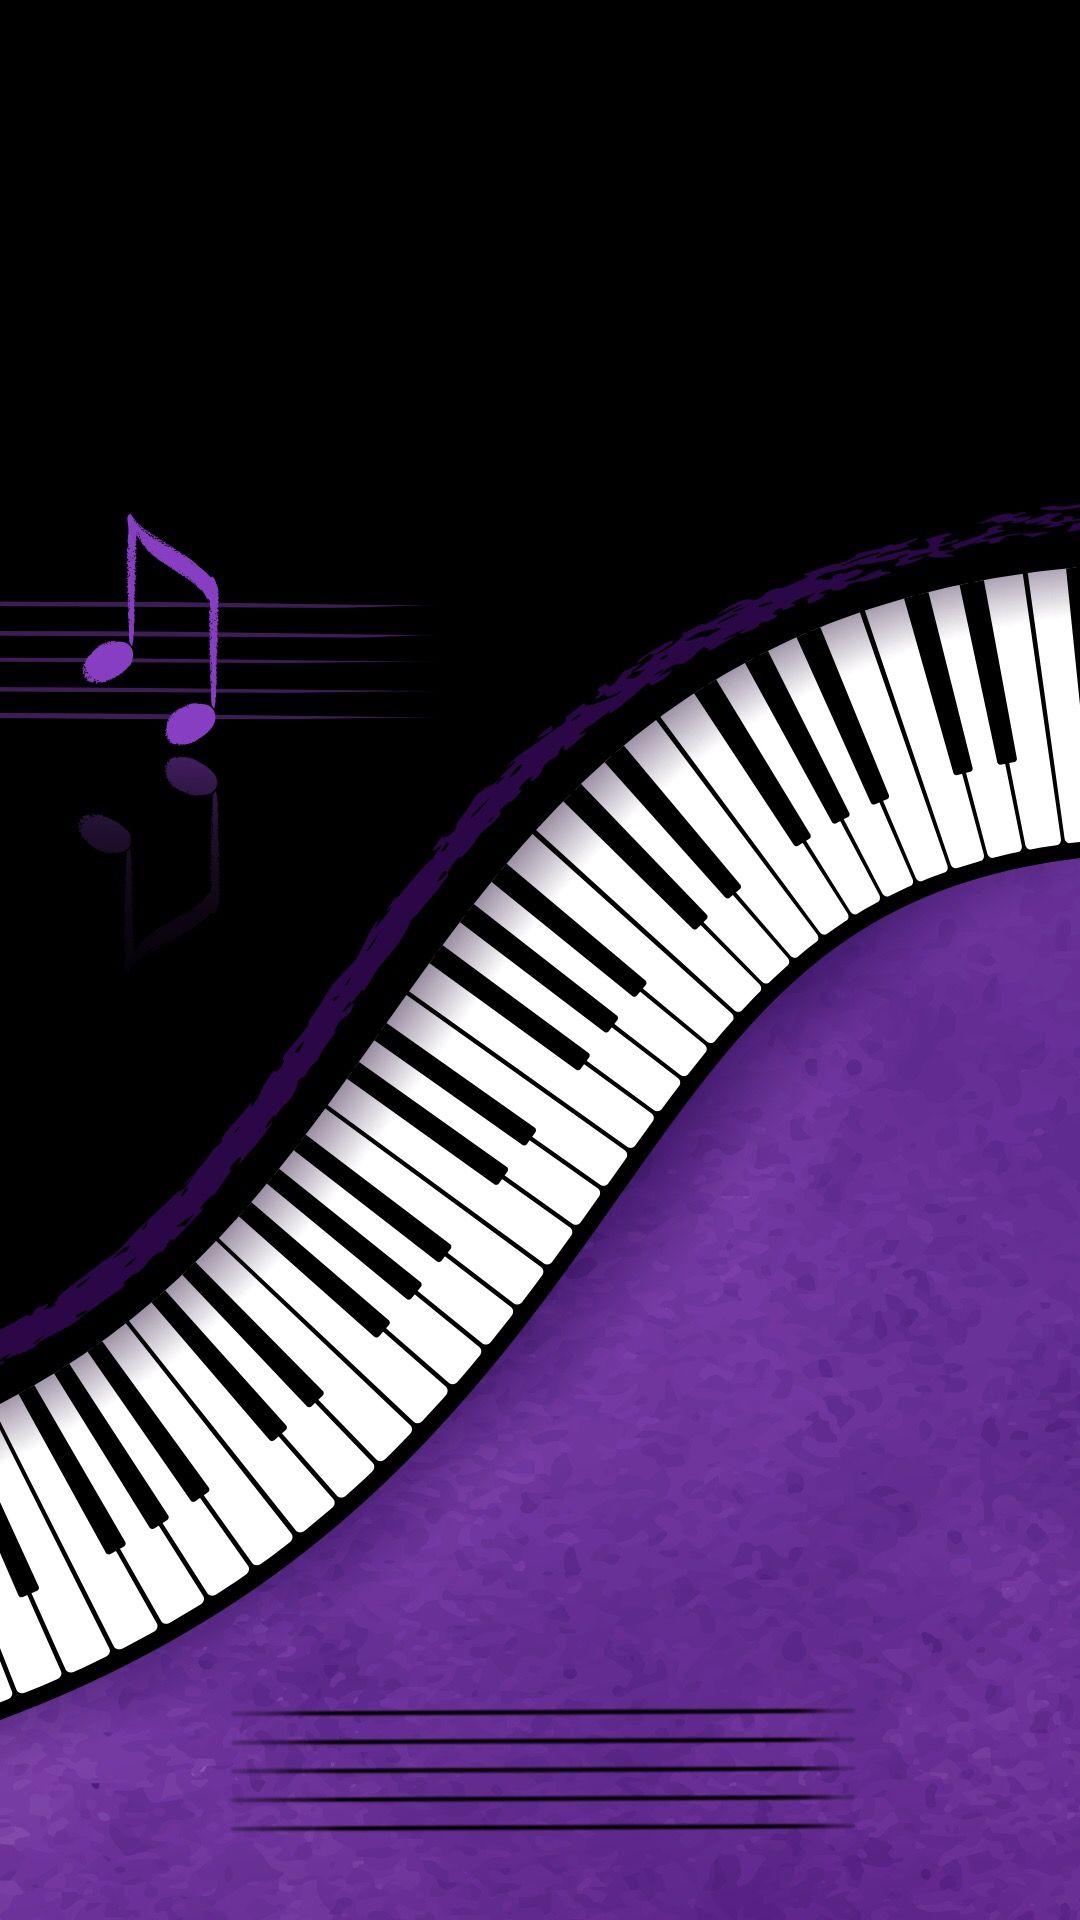 Music Wallpaper Fondo De Pantalla Musical Cuadros De Musica Y